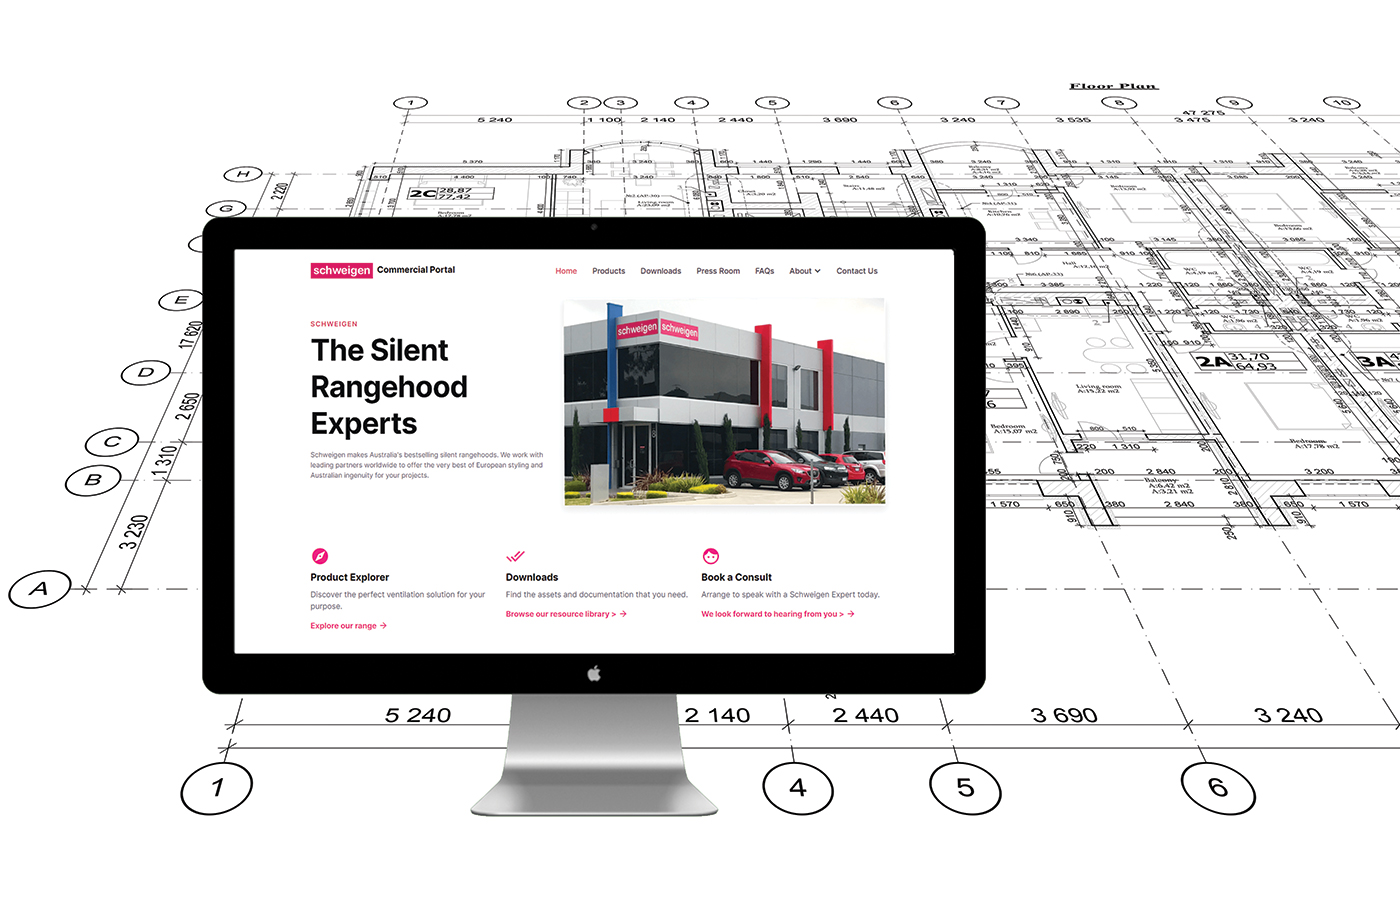 Schweigen launches Commercial Portal